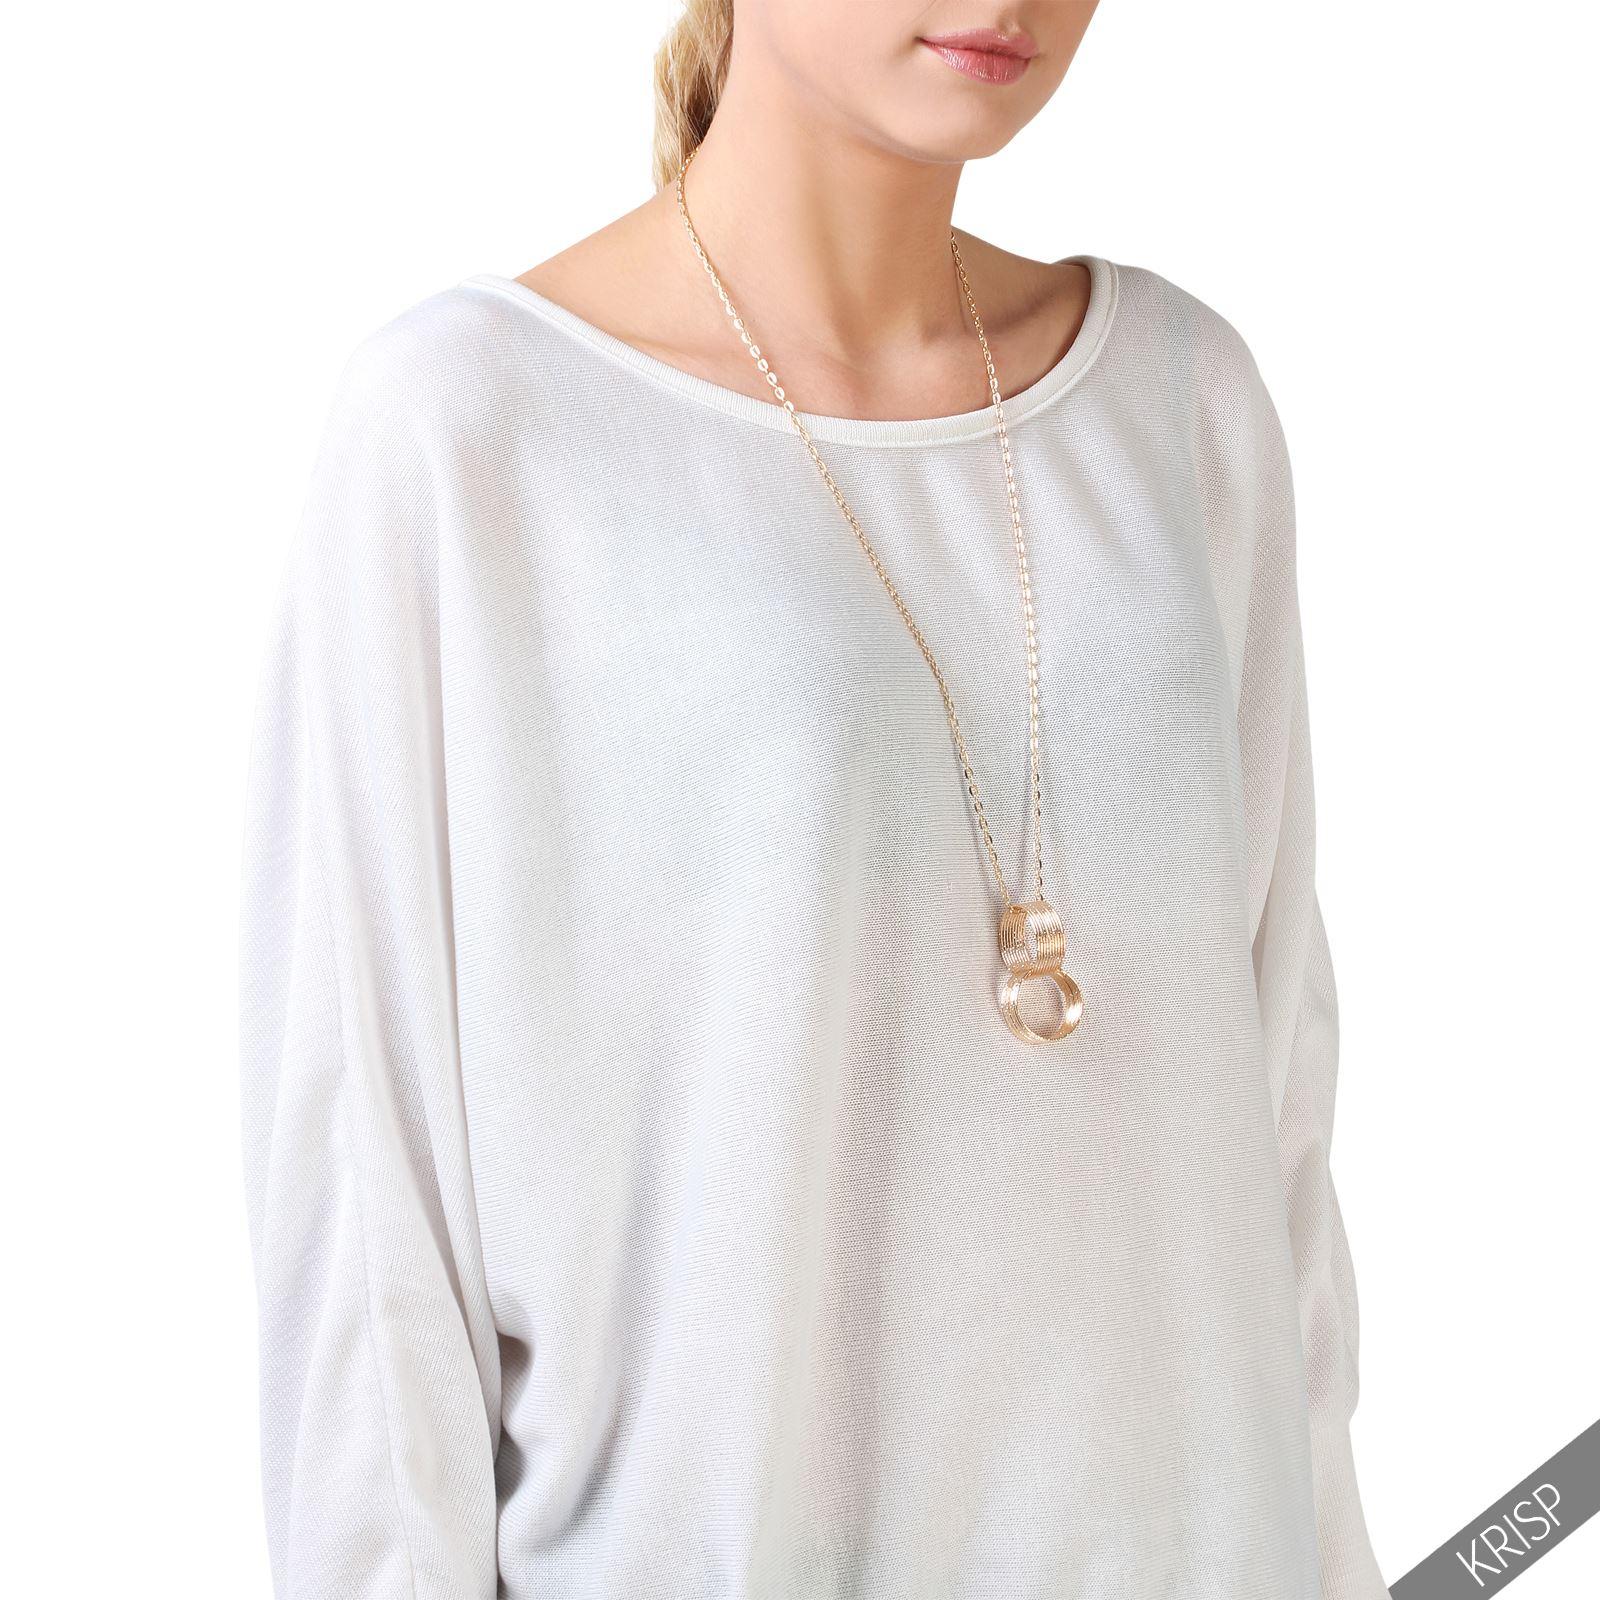 Womens Soft Knit Asymmetric Oversized Batwing Jumper Sweater Top ...